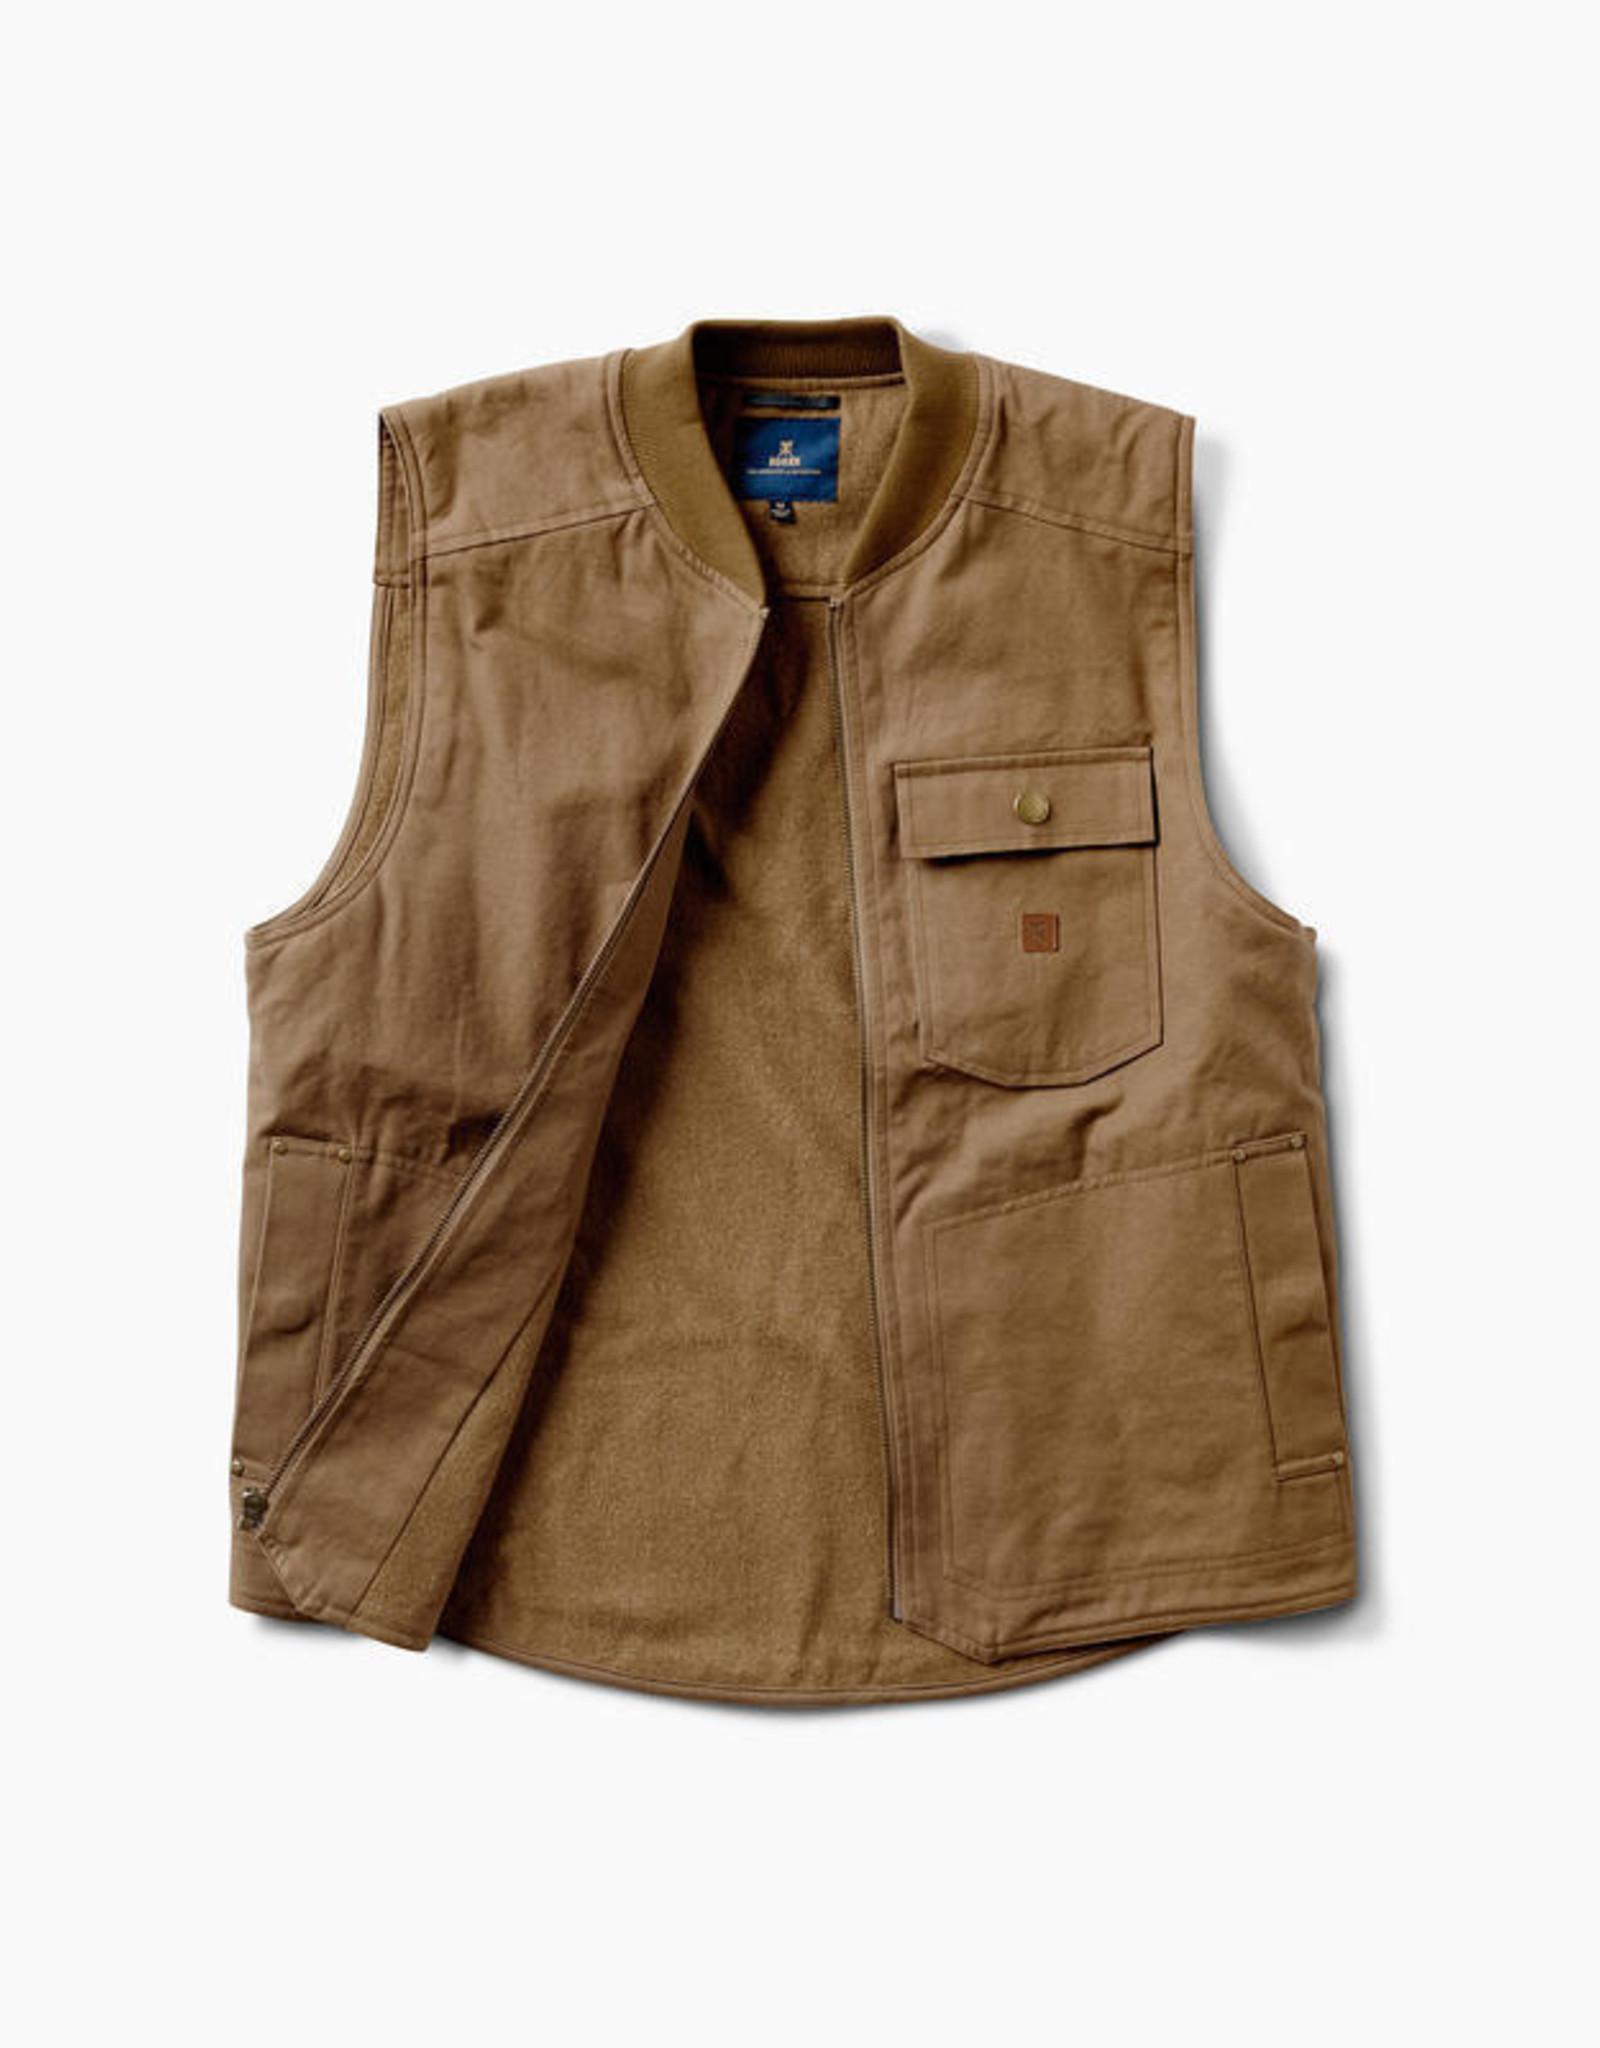 Roark Revival RR Farm Hand Jacket